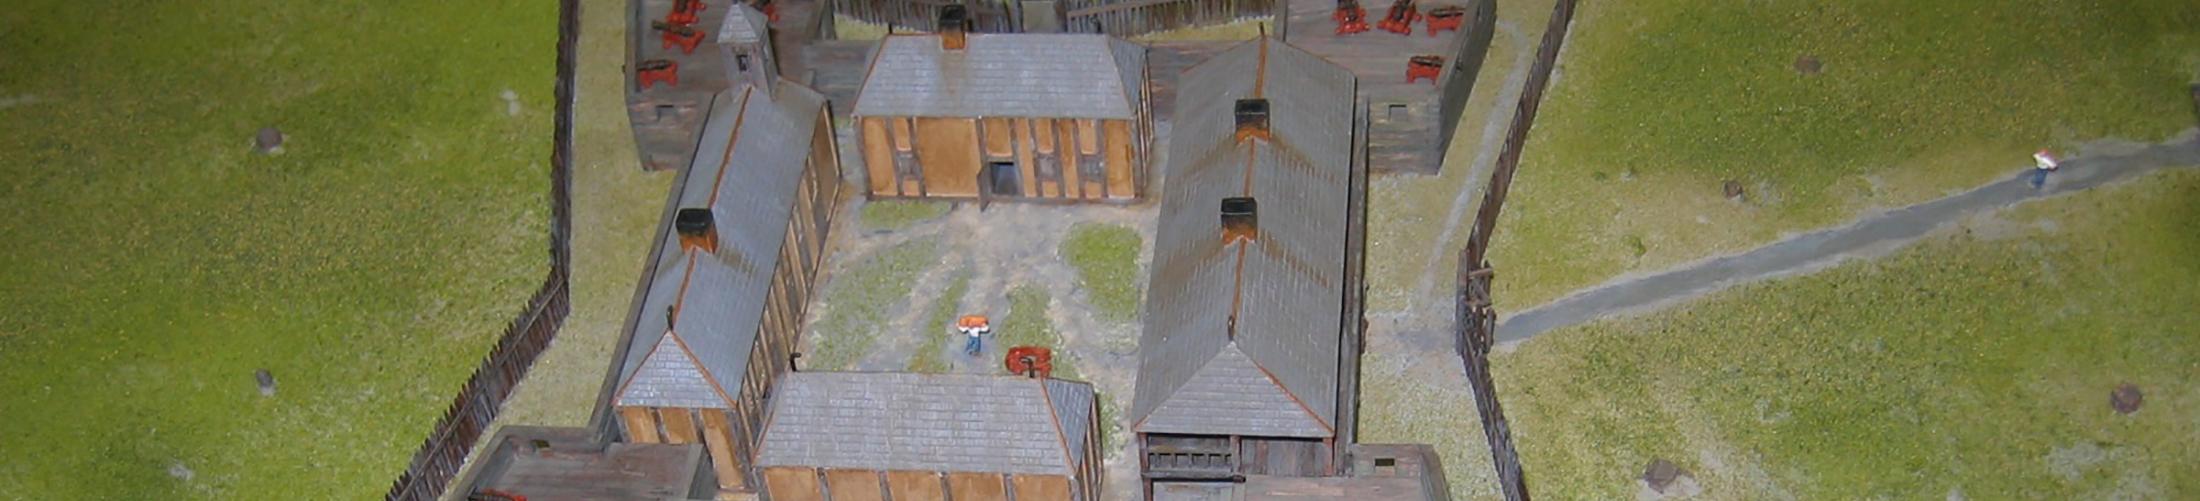 Fort St. Louis